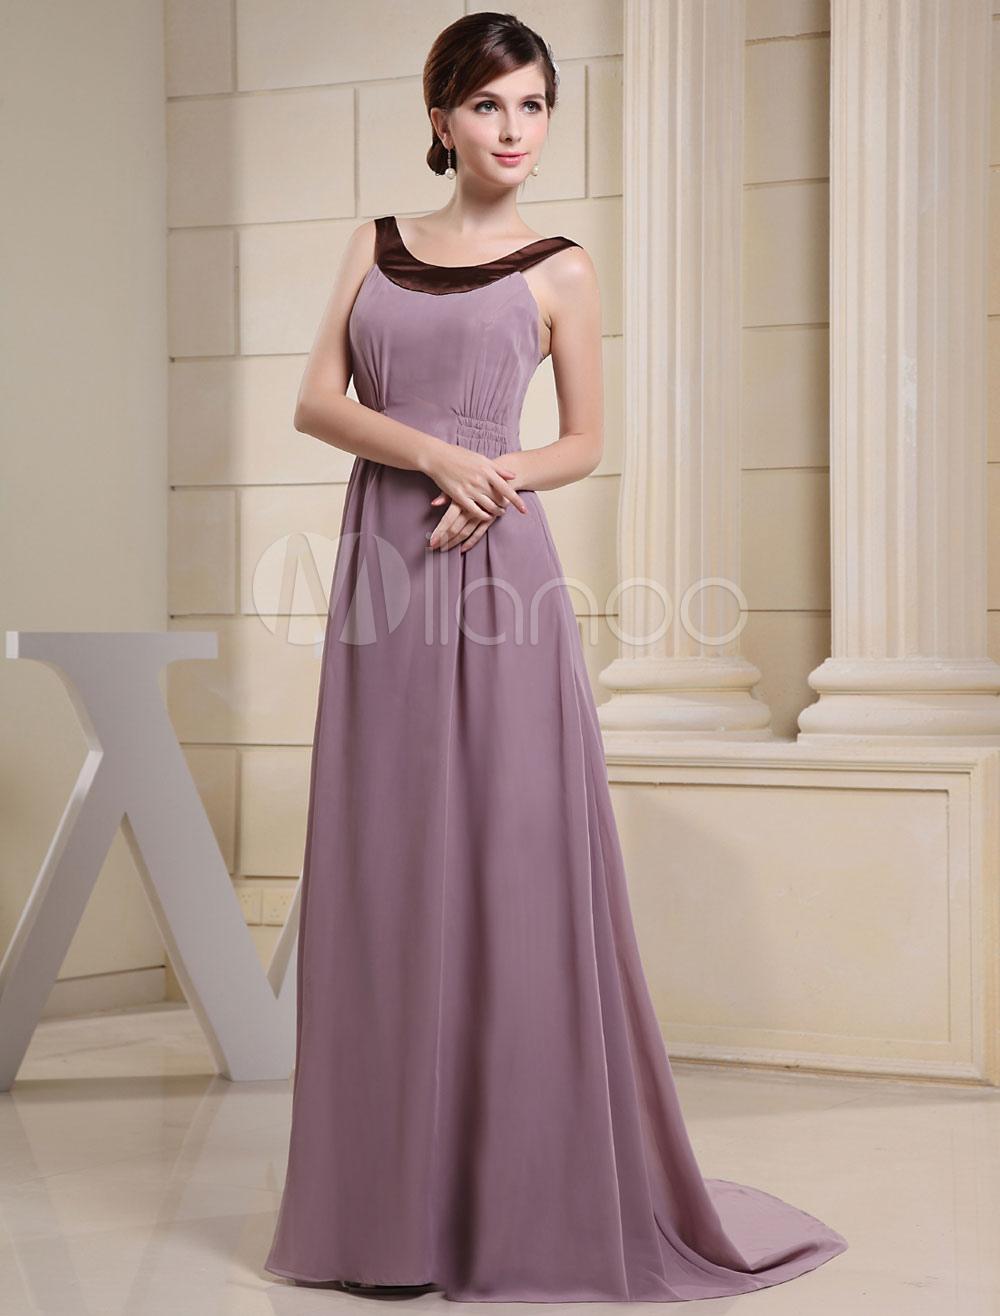 403e4589017 Lavender Evening Dress Jewel Neckline Elastic Pleated Court Train ...